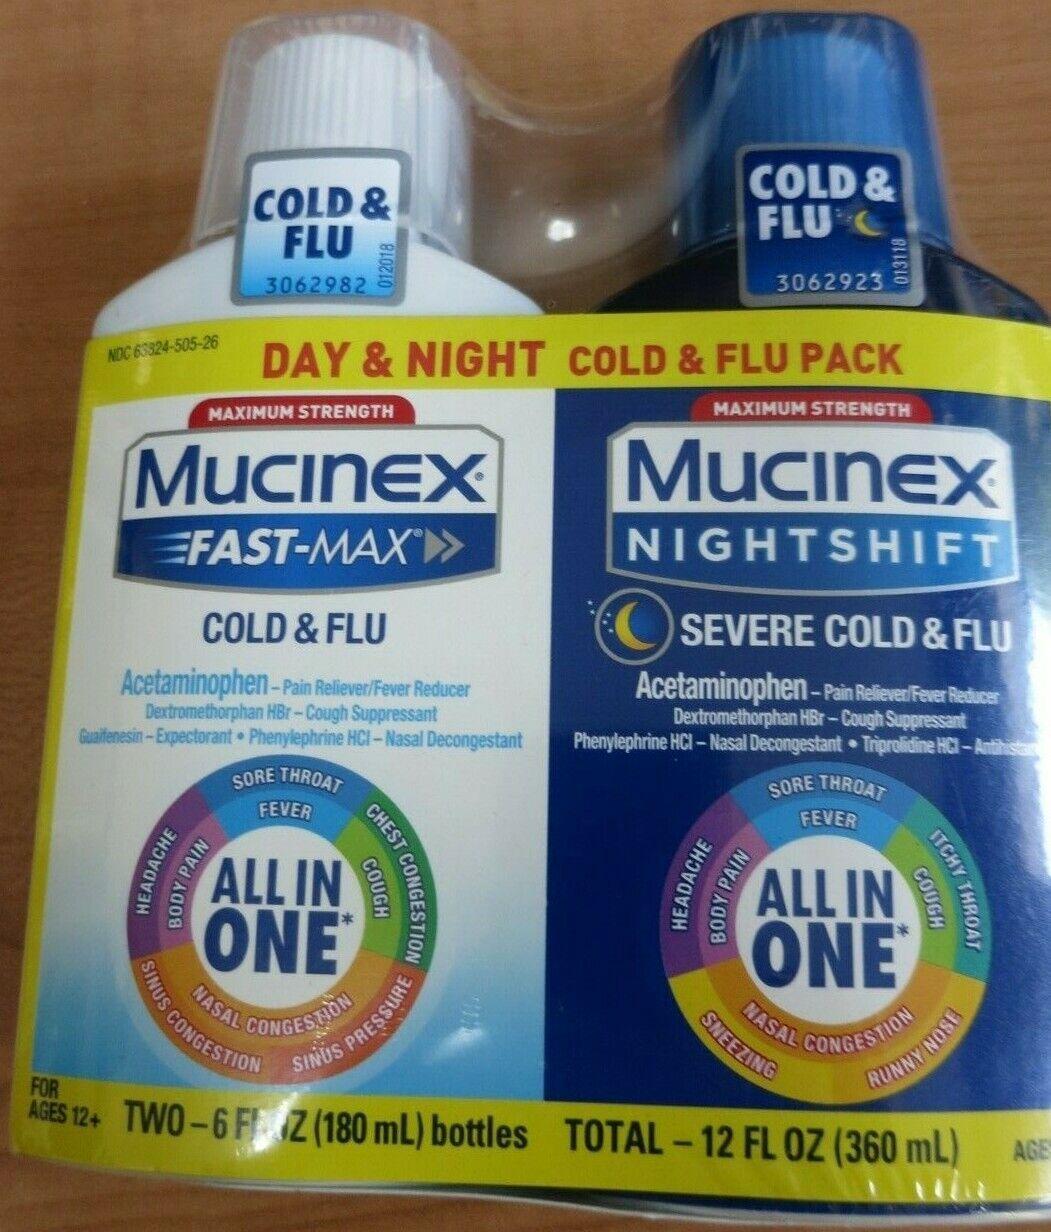 Mucinex Fast-Max Day Time Cold & Flu Night Time Cold & Flu L